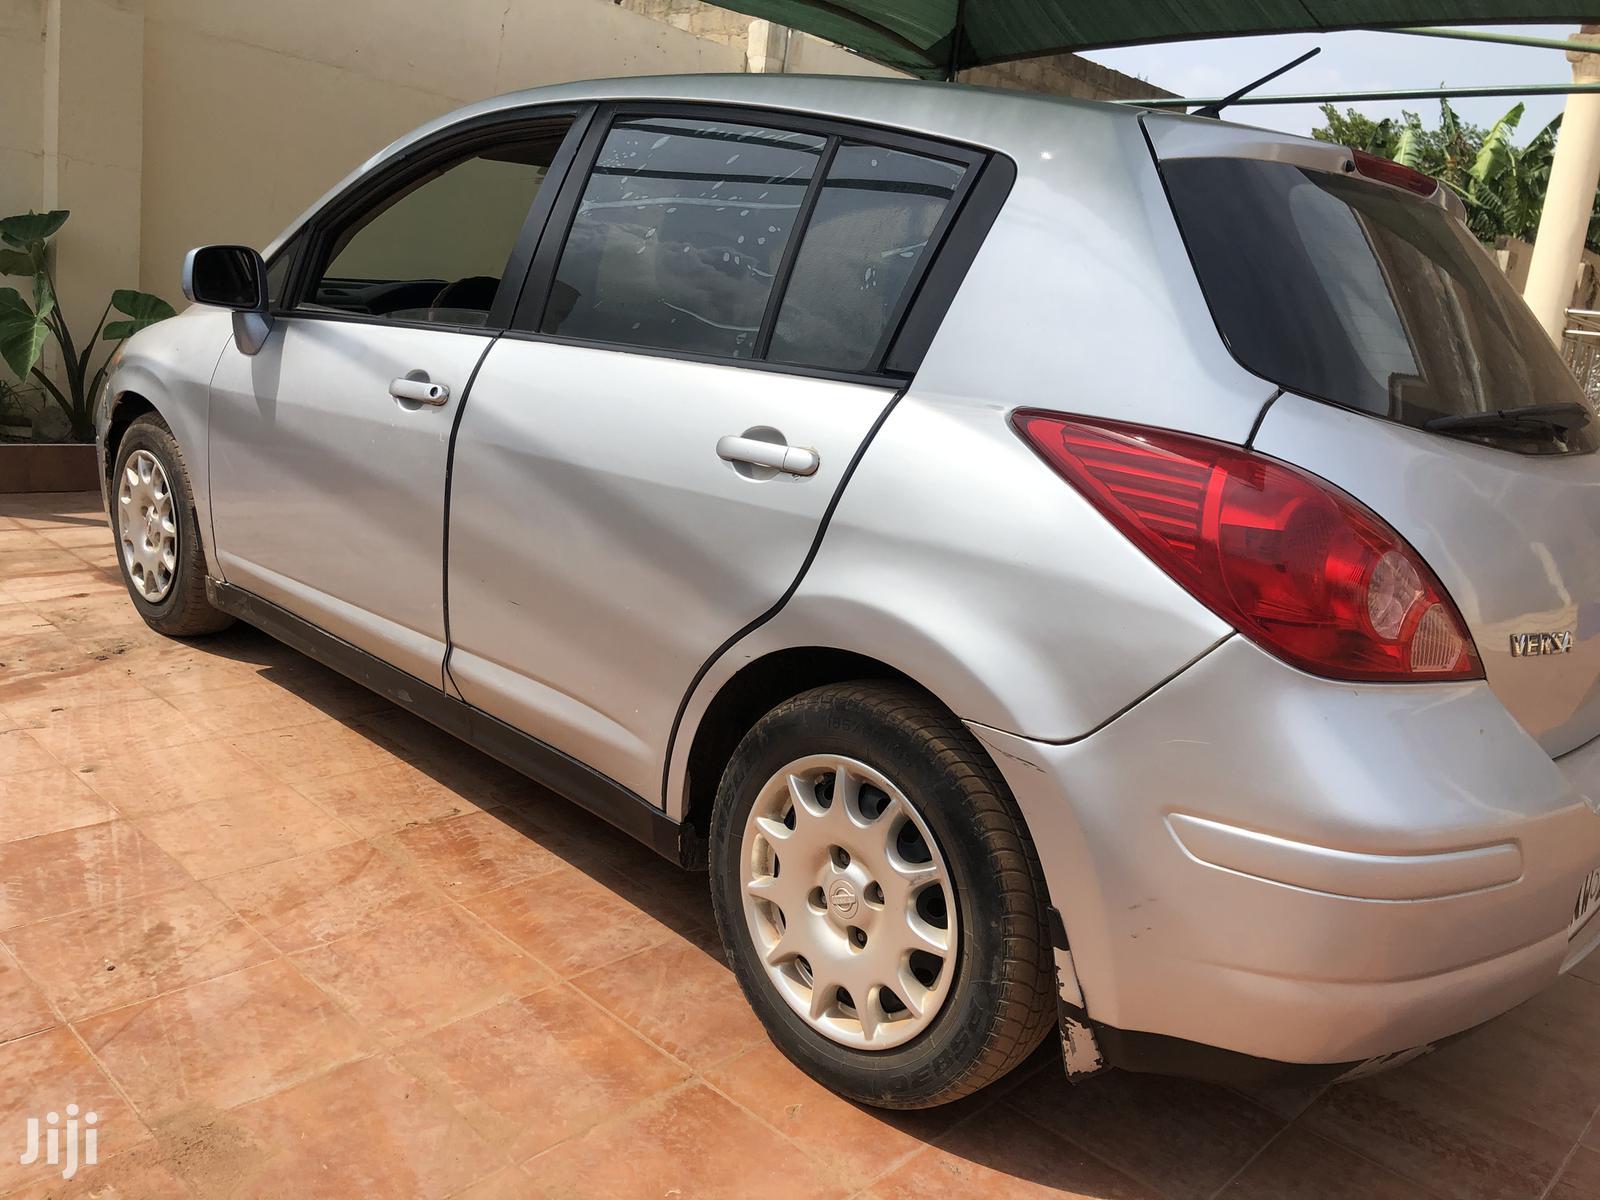 Archive Nissan Versa 2009 Hatchback 1 8 S Silver In Achimota Cars Nana Sarpong Jiji Com Gh